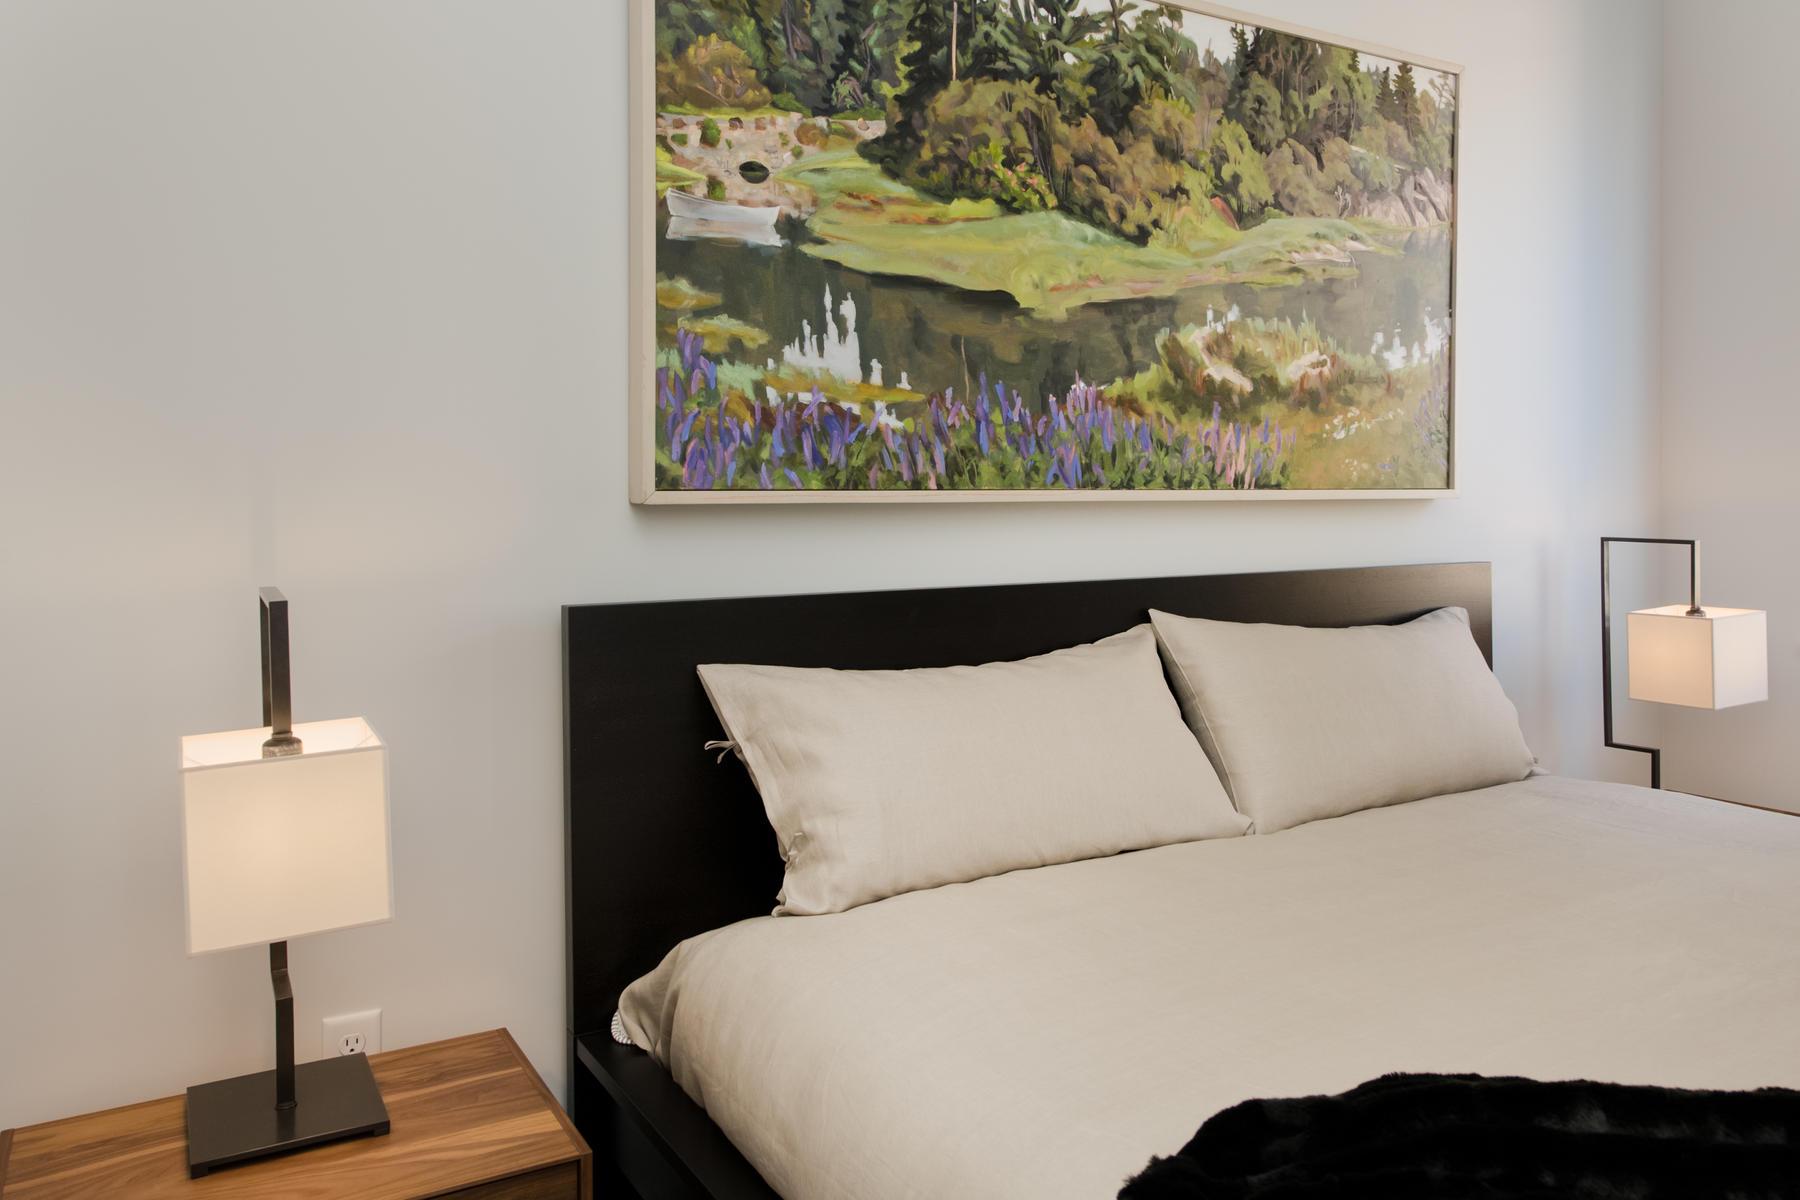 Additional photo for property listing at Ogden Flats 1300 North Ogden Street #402 Denver, Colorado 80218 Estados Unidos